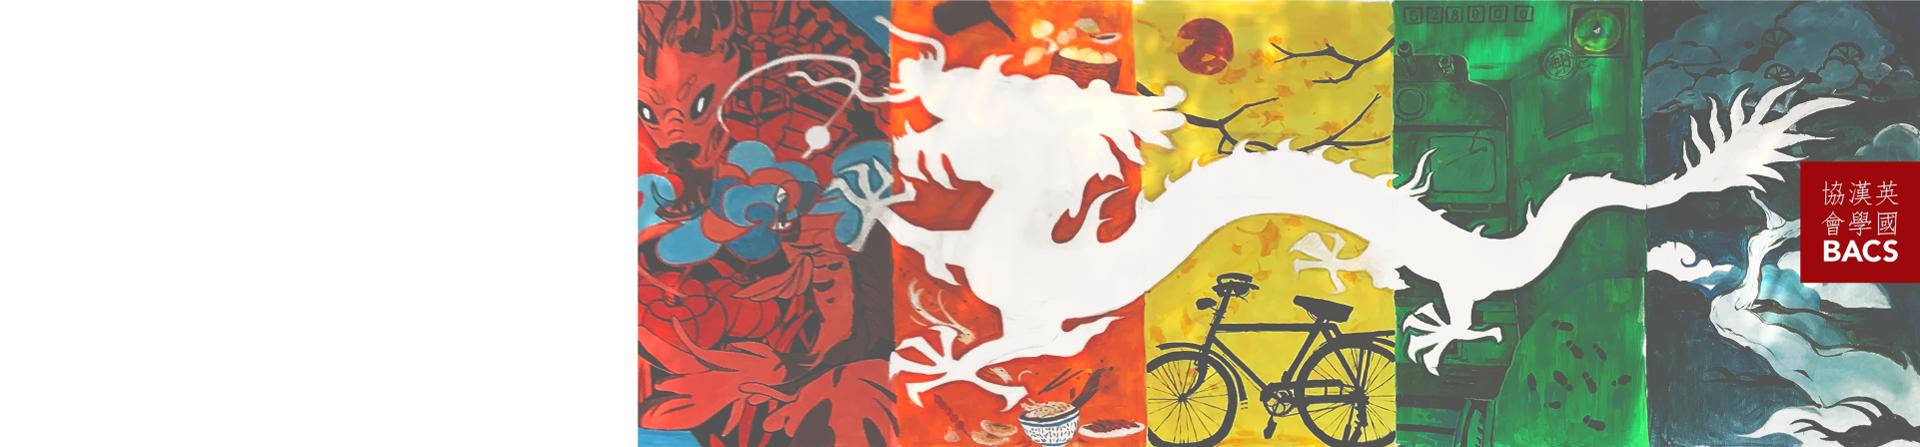 dragon mural beijing 2018 copyright Gerda Wielander